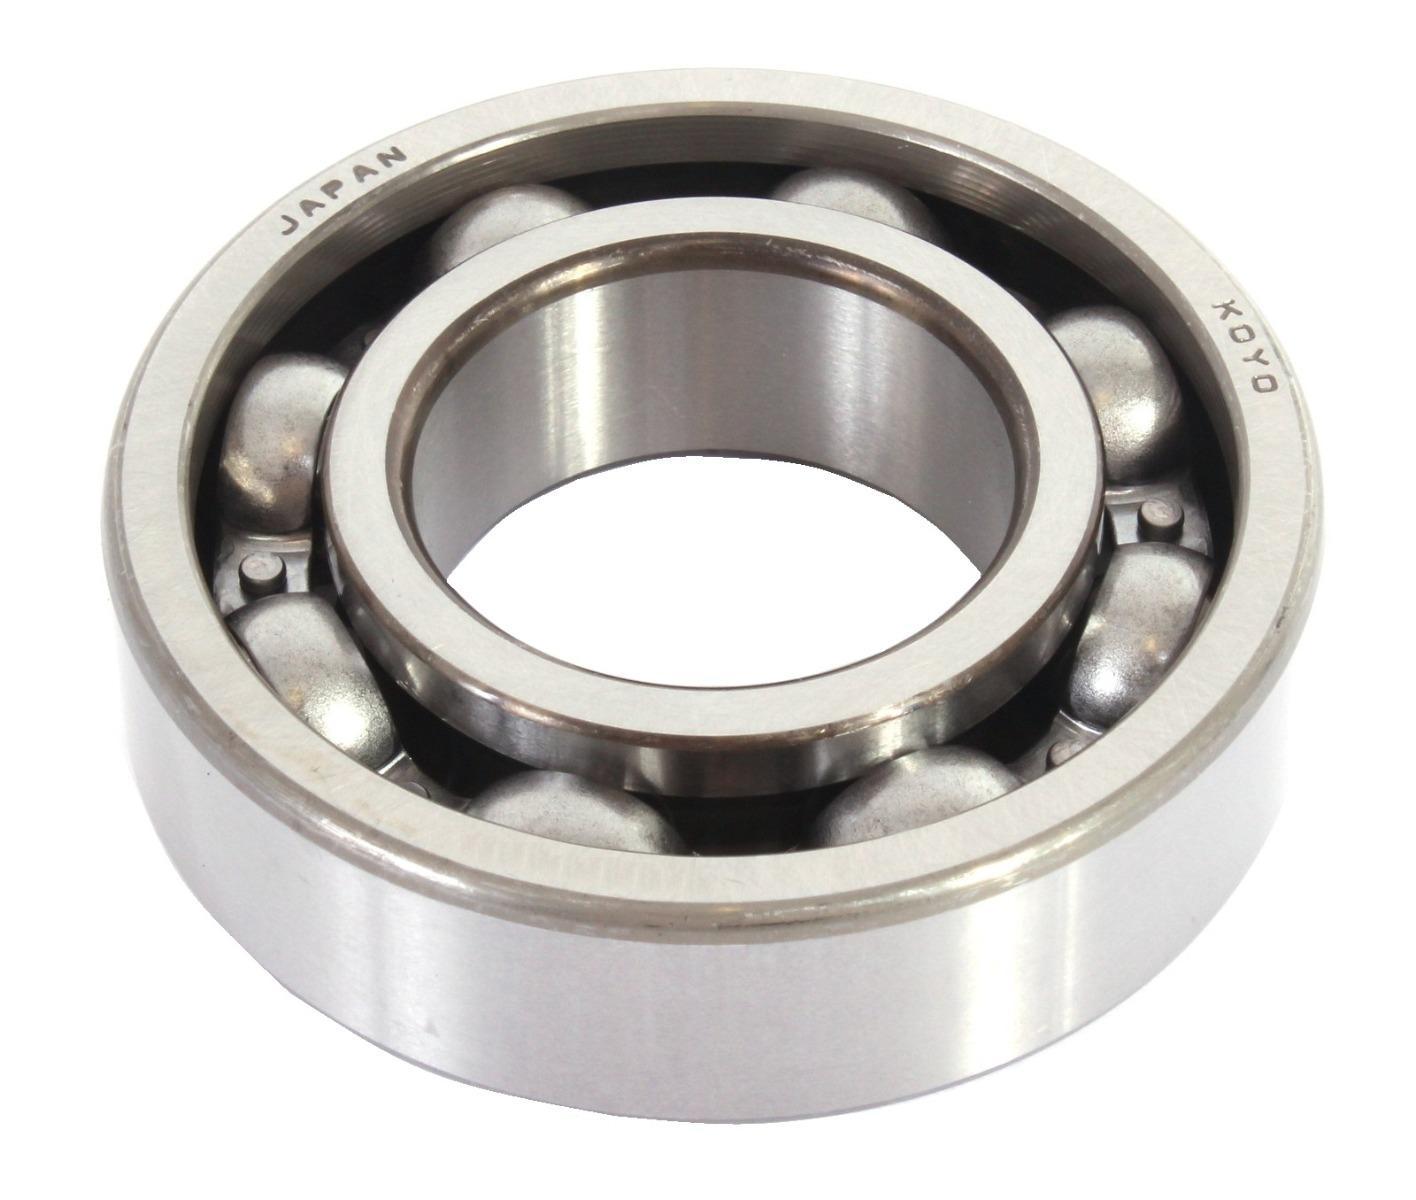 All Balls Engine Bearing 63/28-C3 63/28C3 Bearings Automotive prb ...